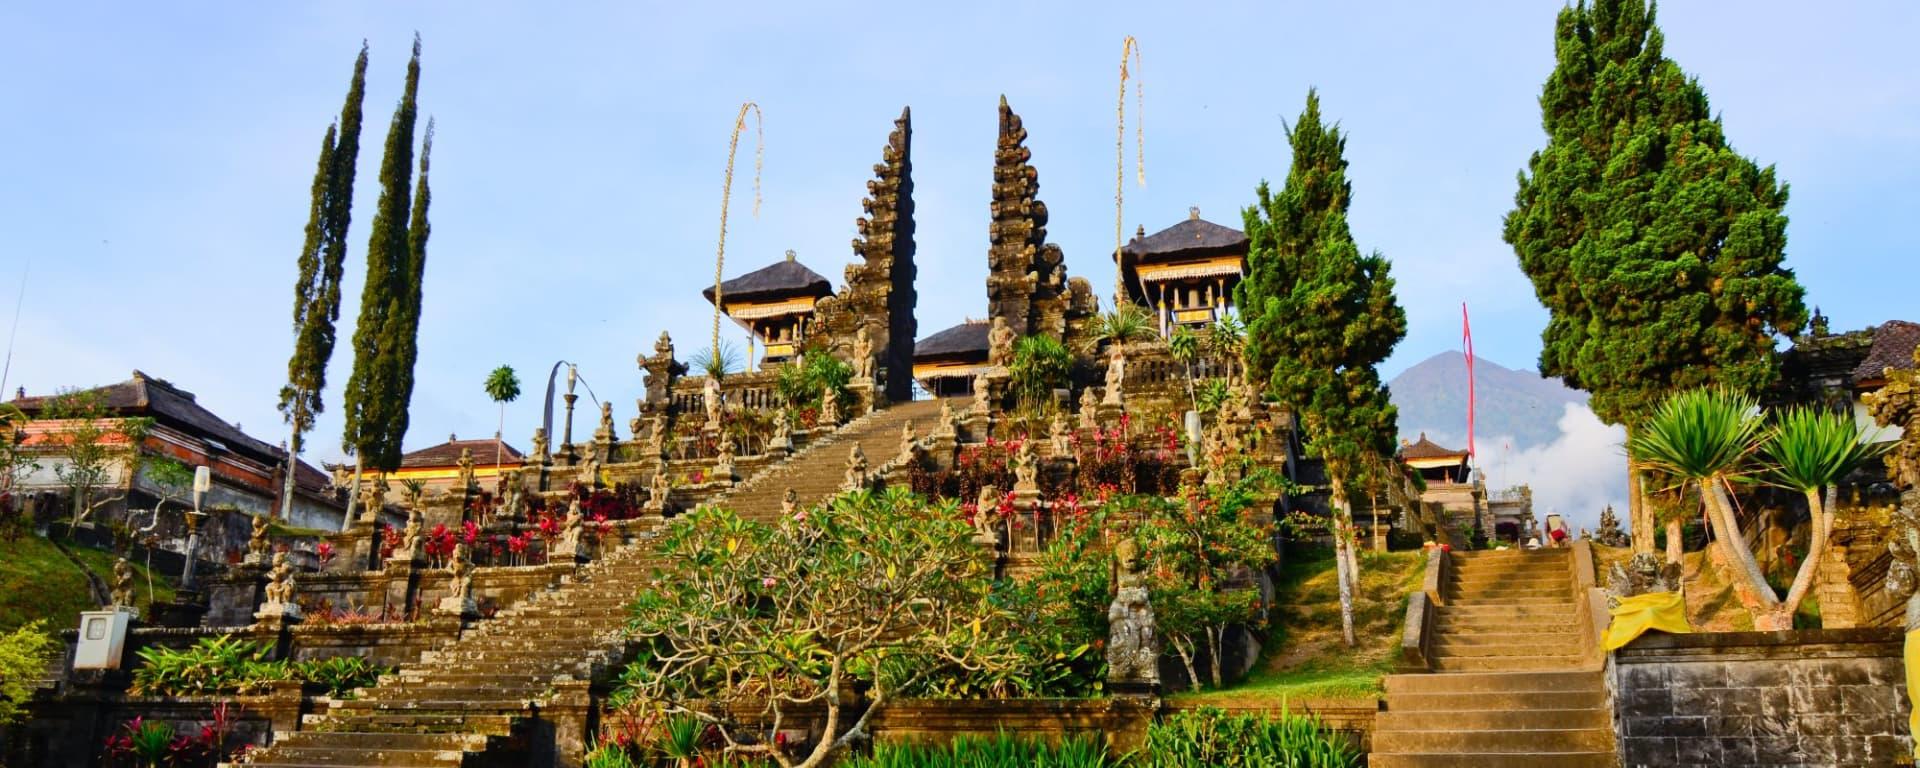 Bali de son propre chef - 1 journée à Sud de Bali: Bali Pura Besakih Temple